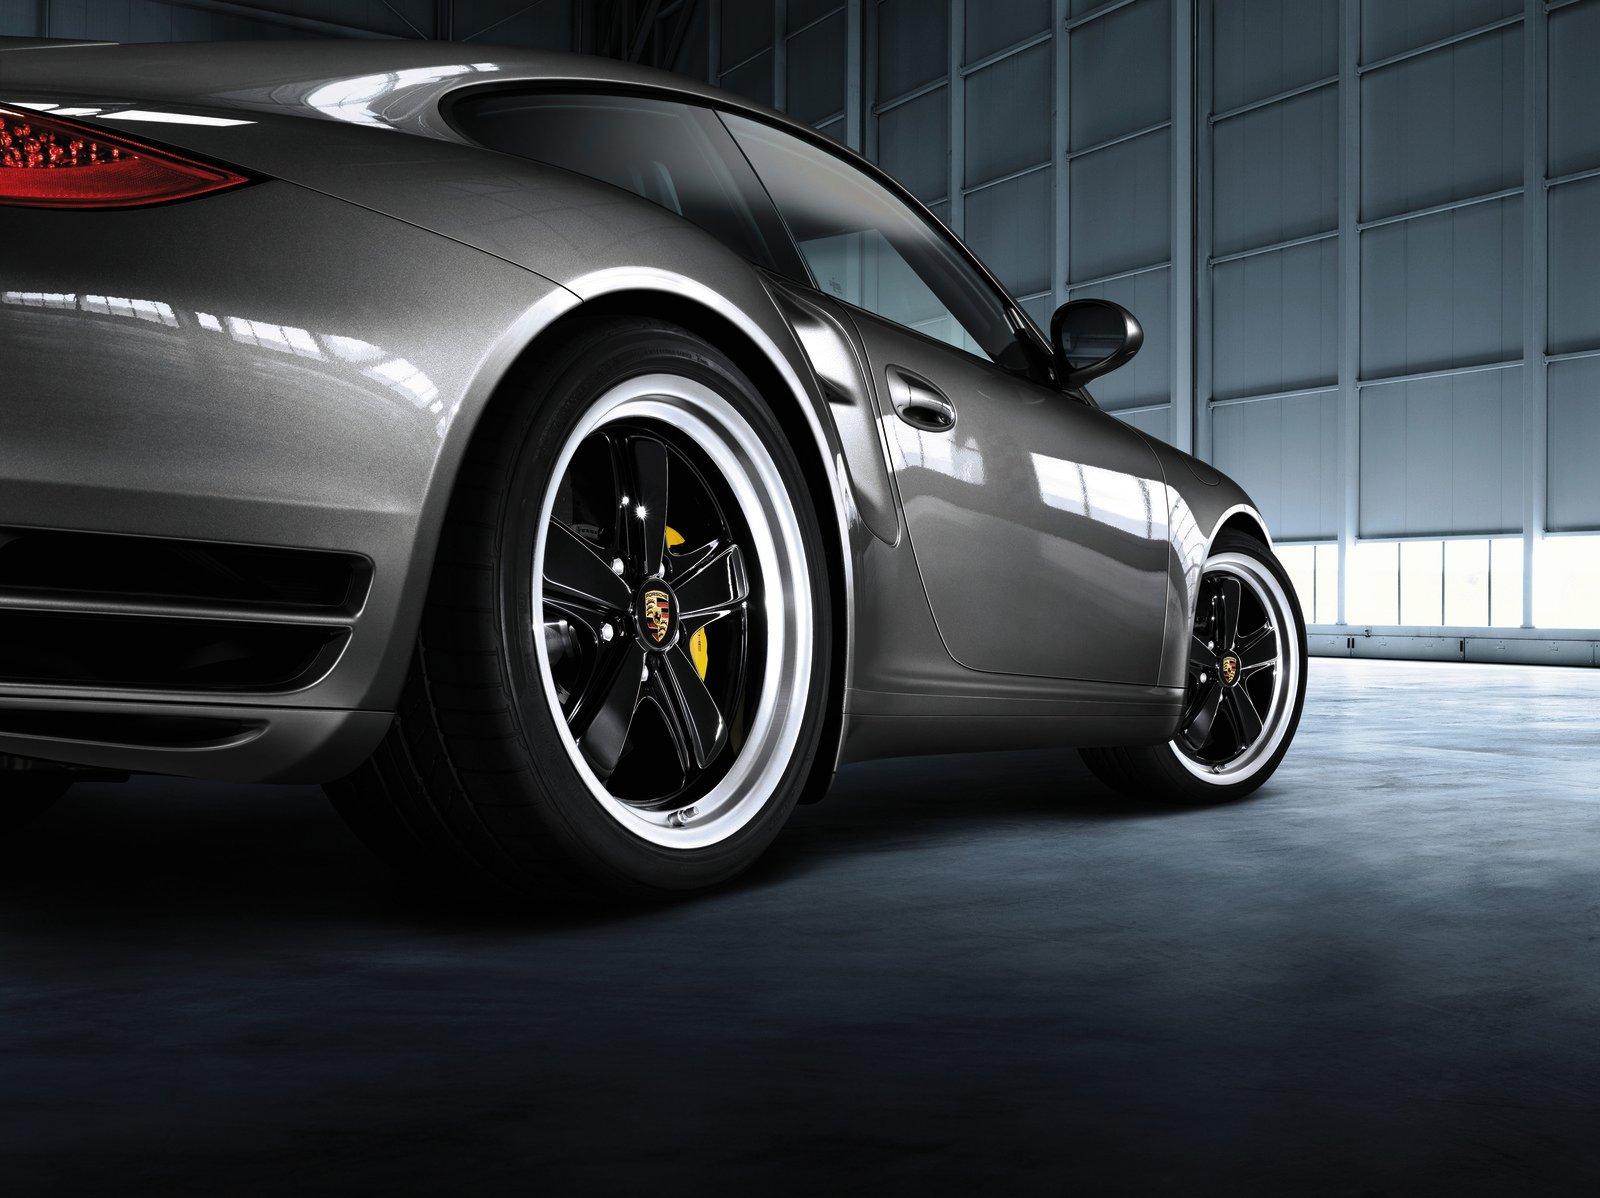 Porsche unveils new tequipment retrofits for 911 cayman panamera porsche unveils new tequipment retrofits for 911 cayman panamera more publicscrutiny Choice Image